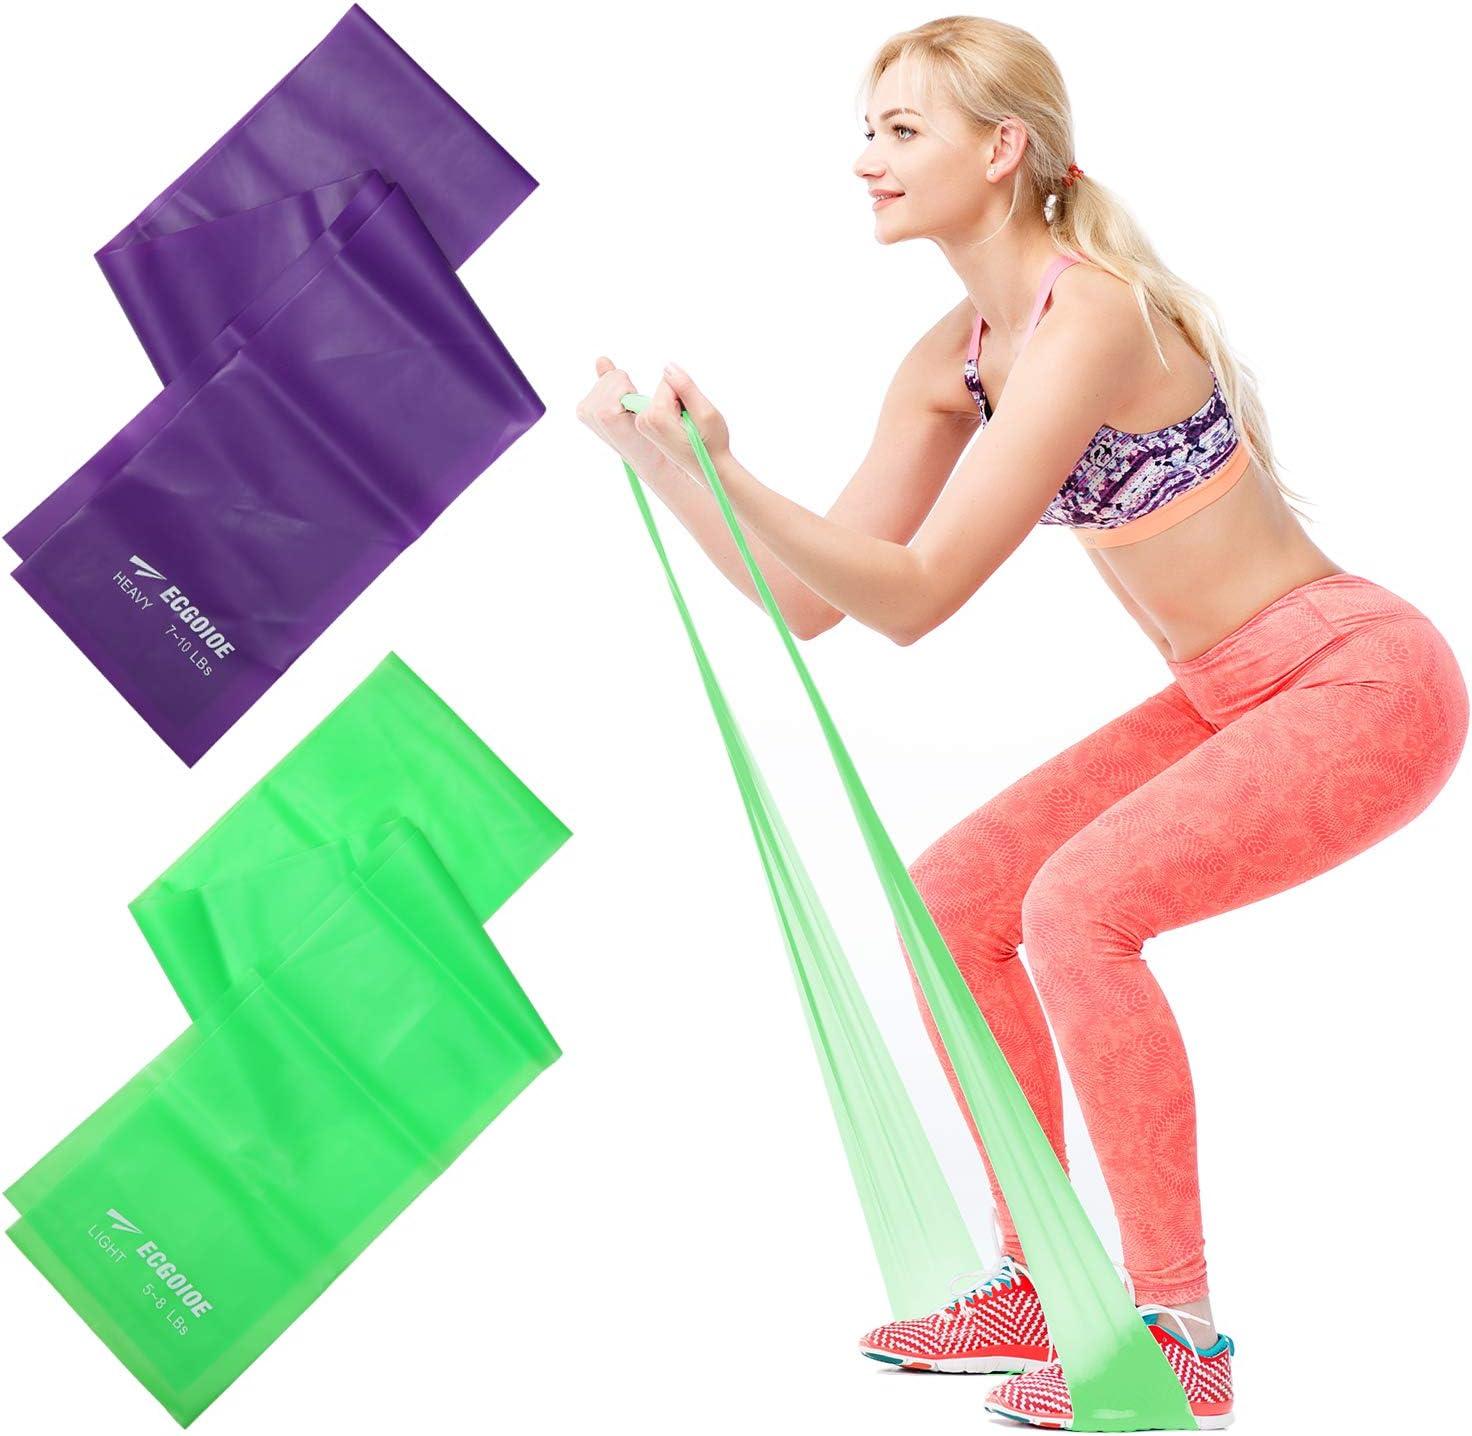 Strong Resistance Tube Band Set Yoga Sports Gym Home Exercise Workout-Orange